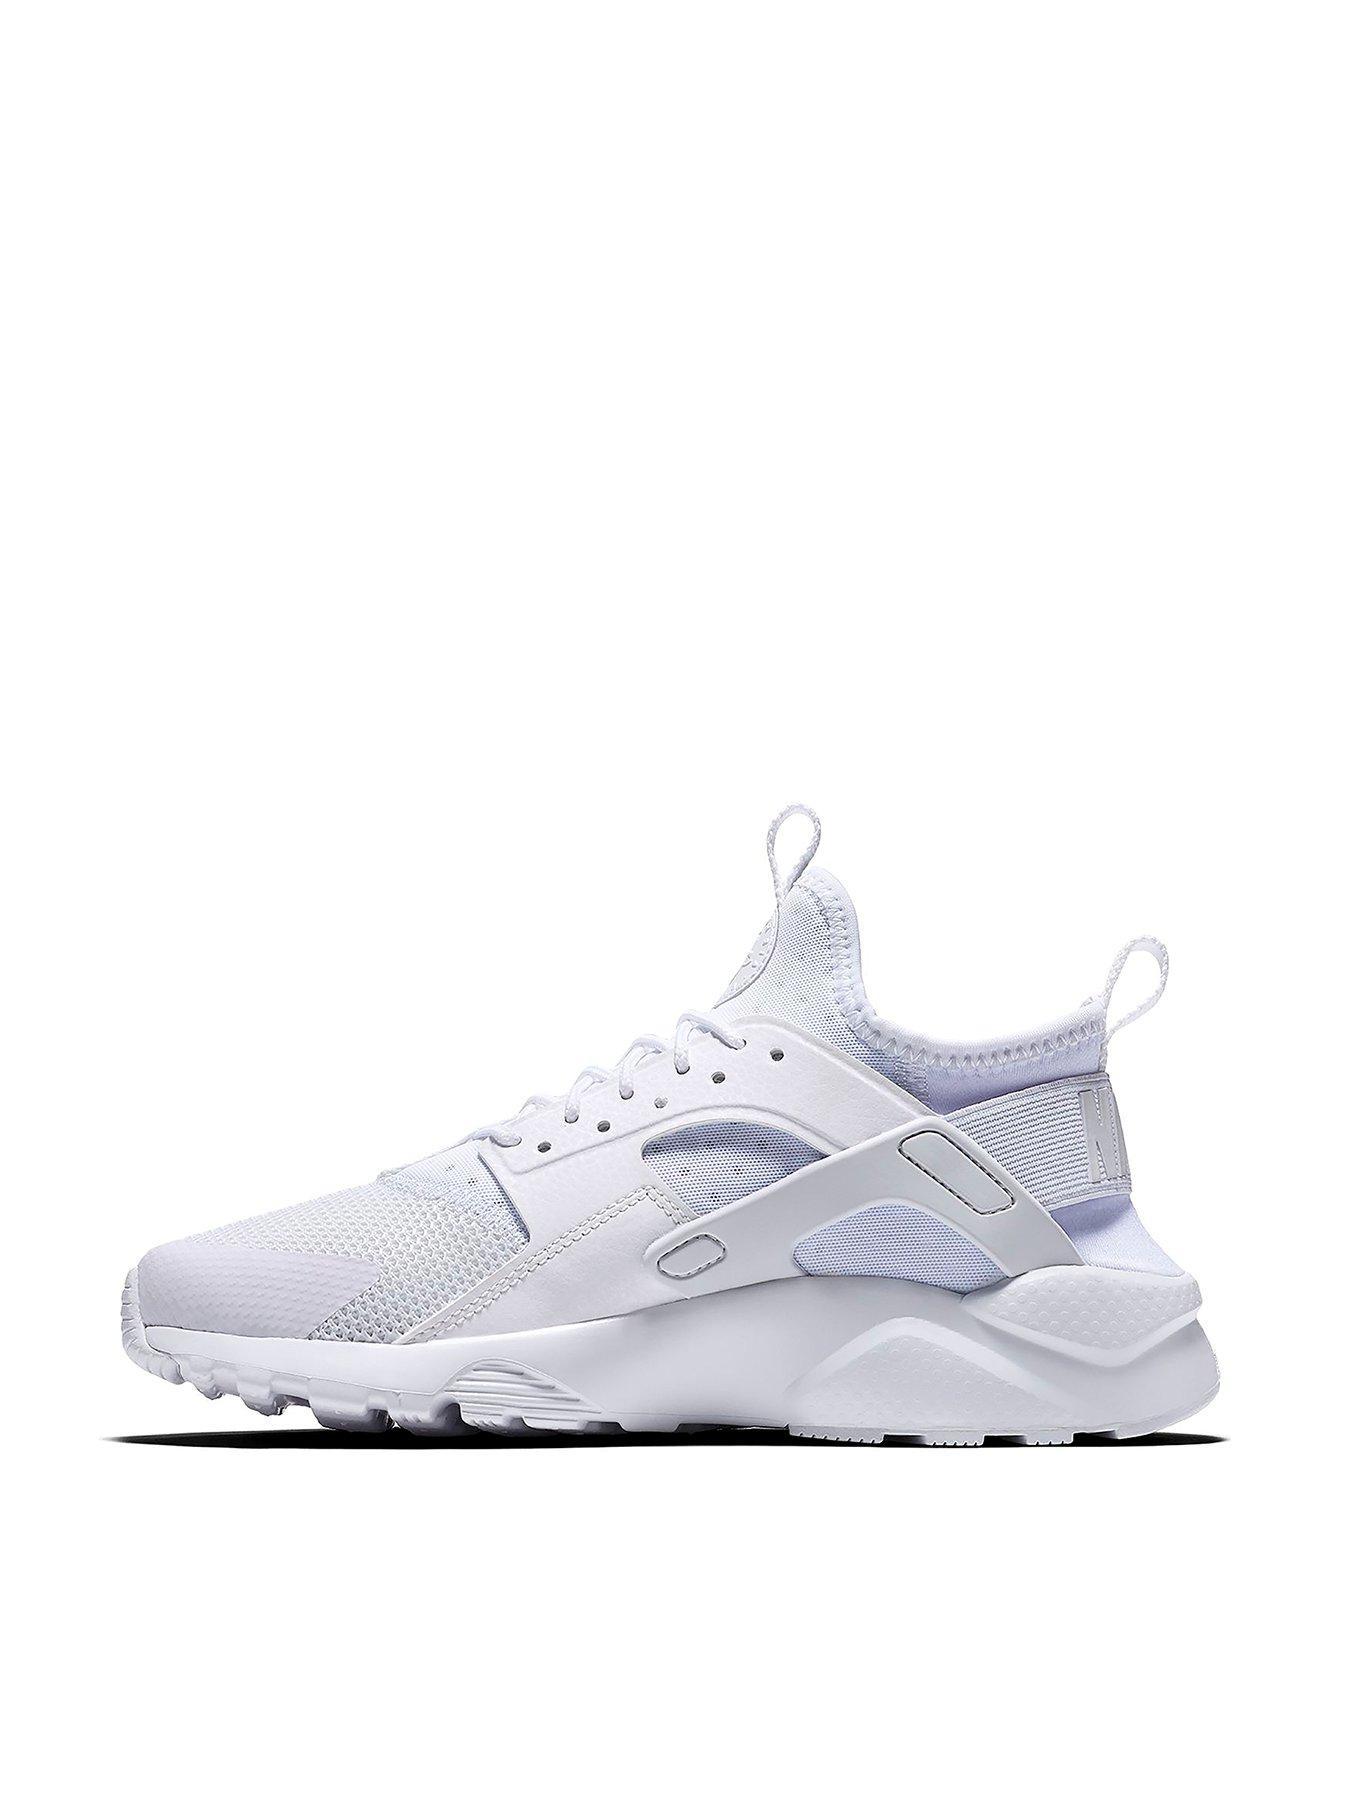 ... nike nike air huarache run ultra junior trainer nike nike air huarache  run ultra junior trainer; nike womens blue running shoe free 5.0 mens gs ...